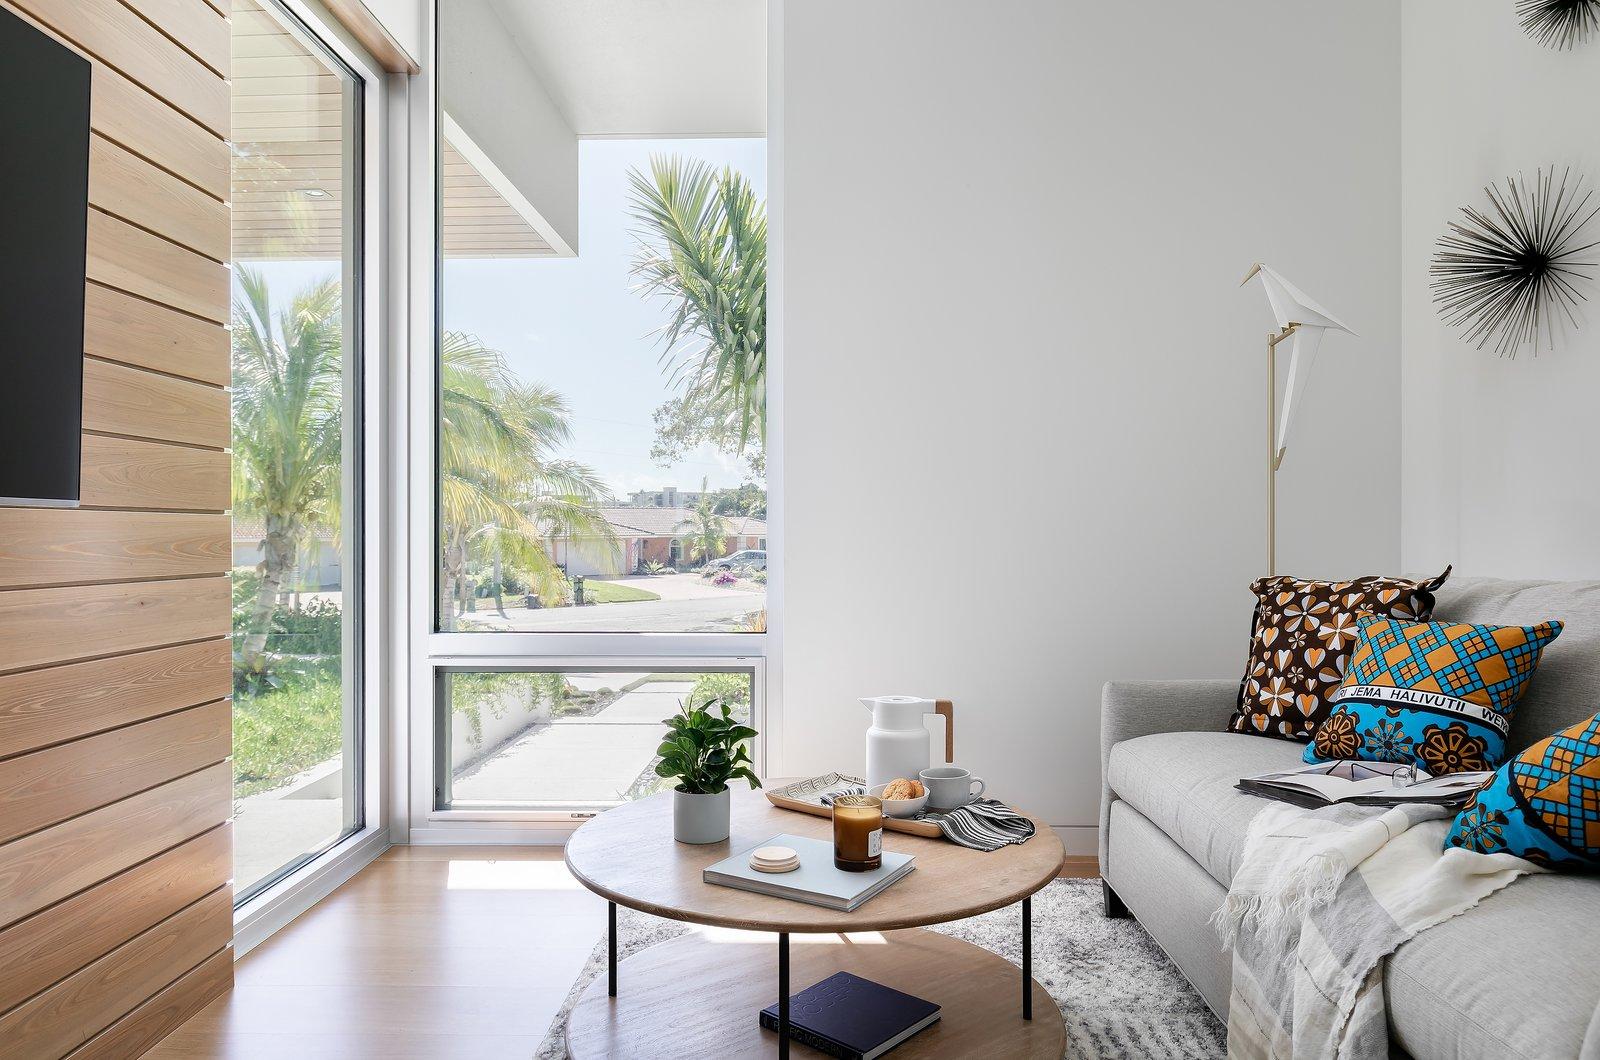 Living Room, Sofa, Coffee Tables, Lamps, Medium Hardwood Floor, and Floor Lighting  Bayview House by Leader Design Studio